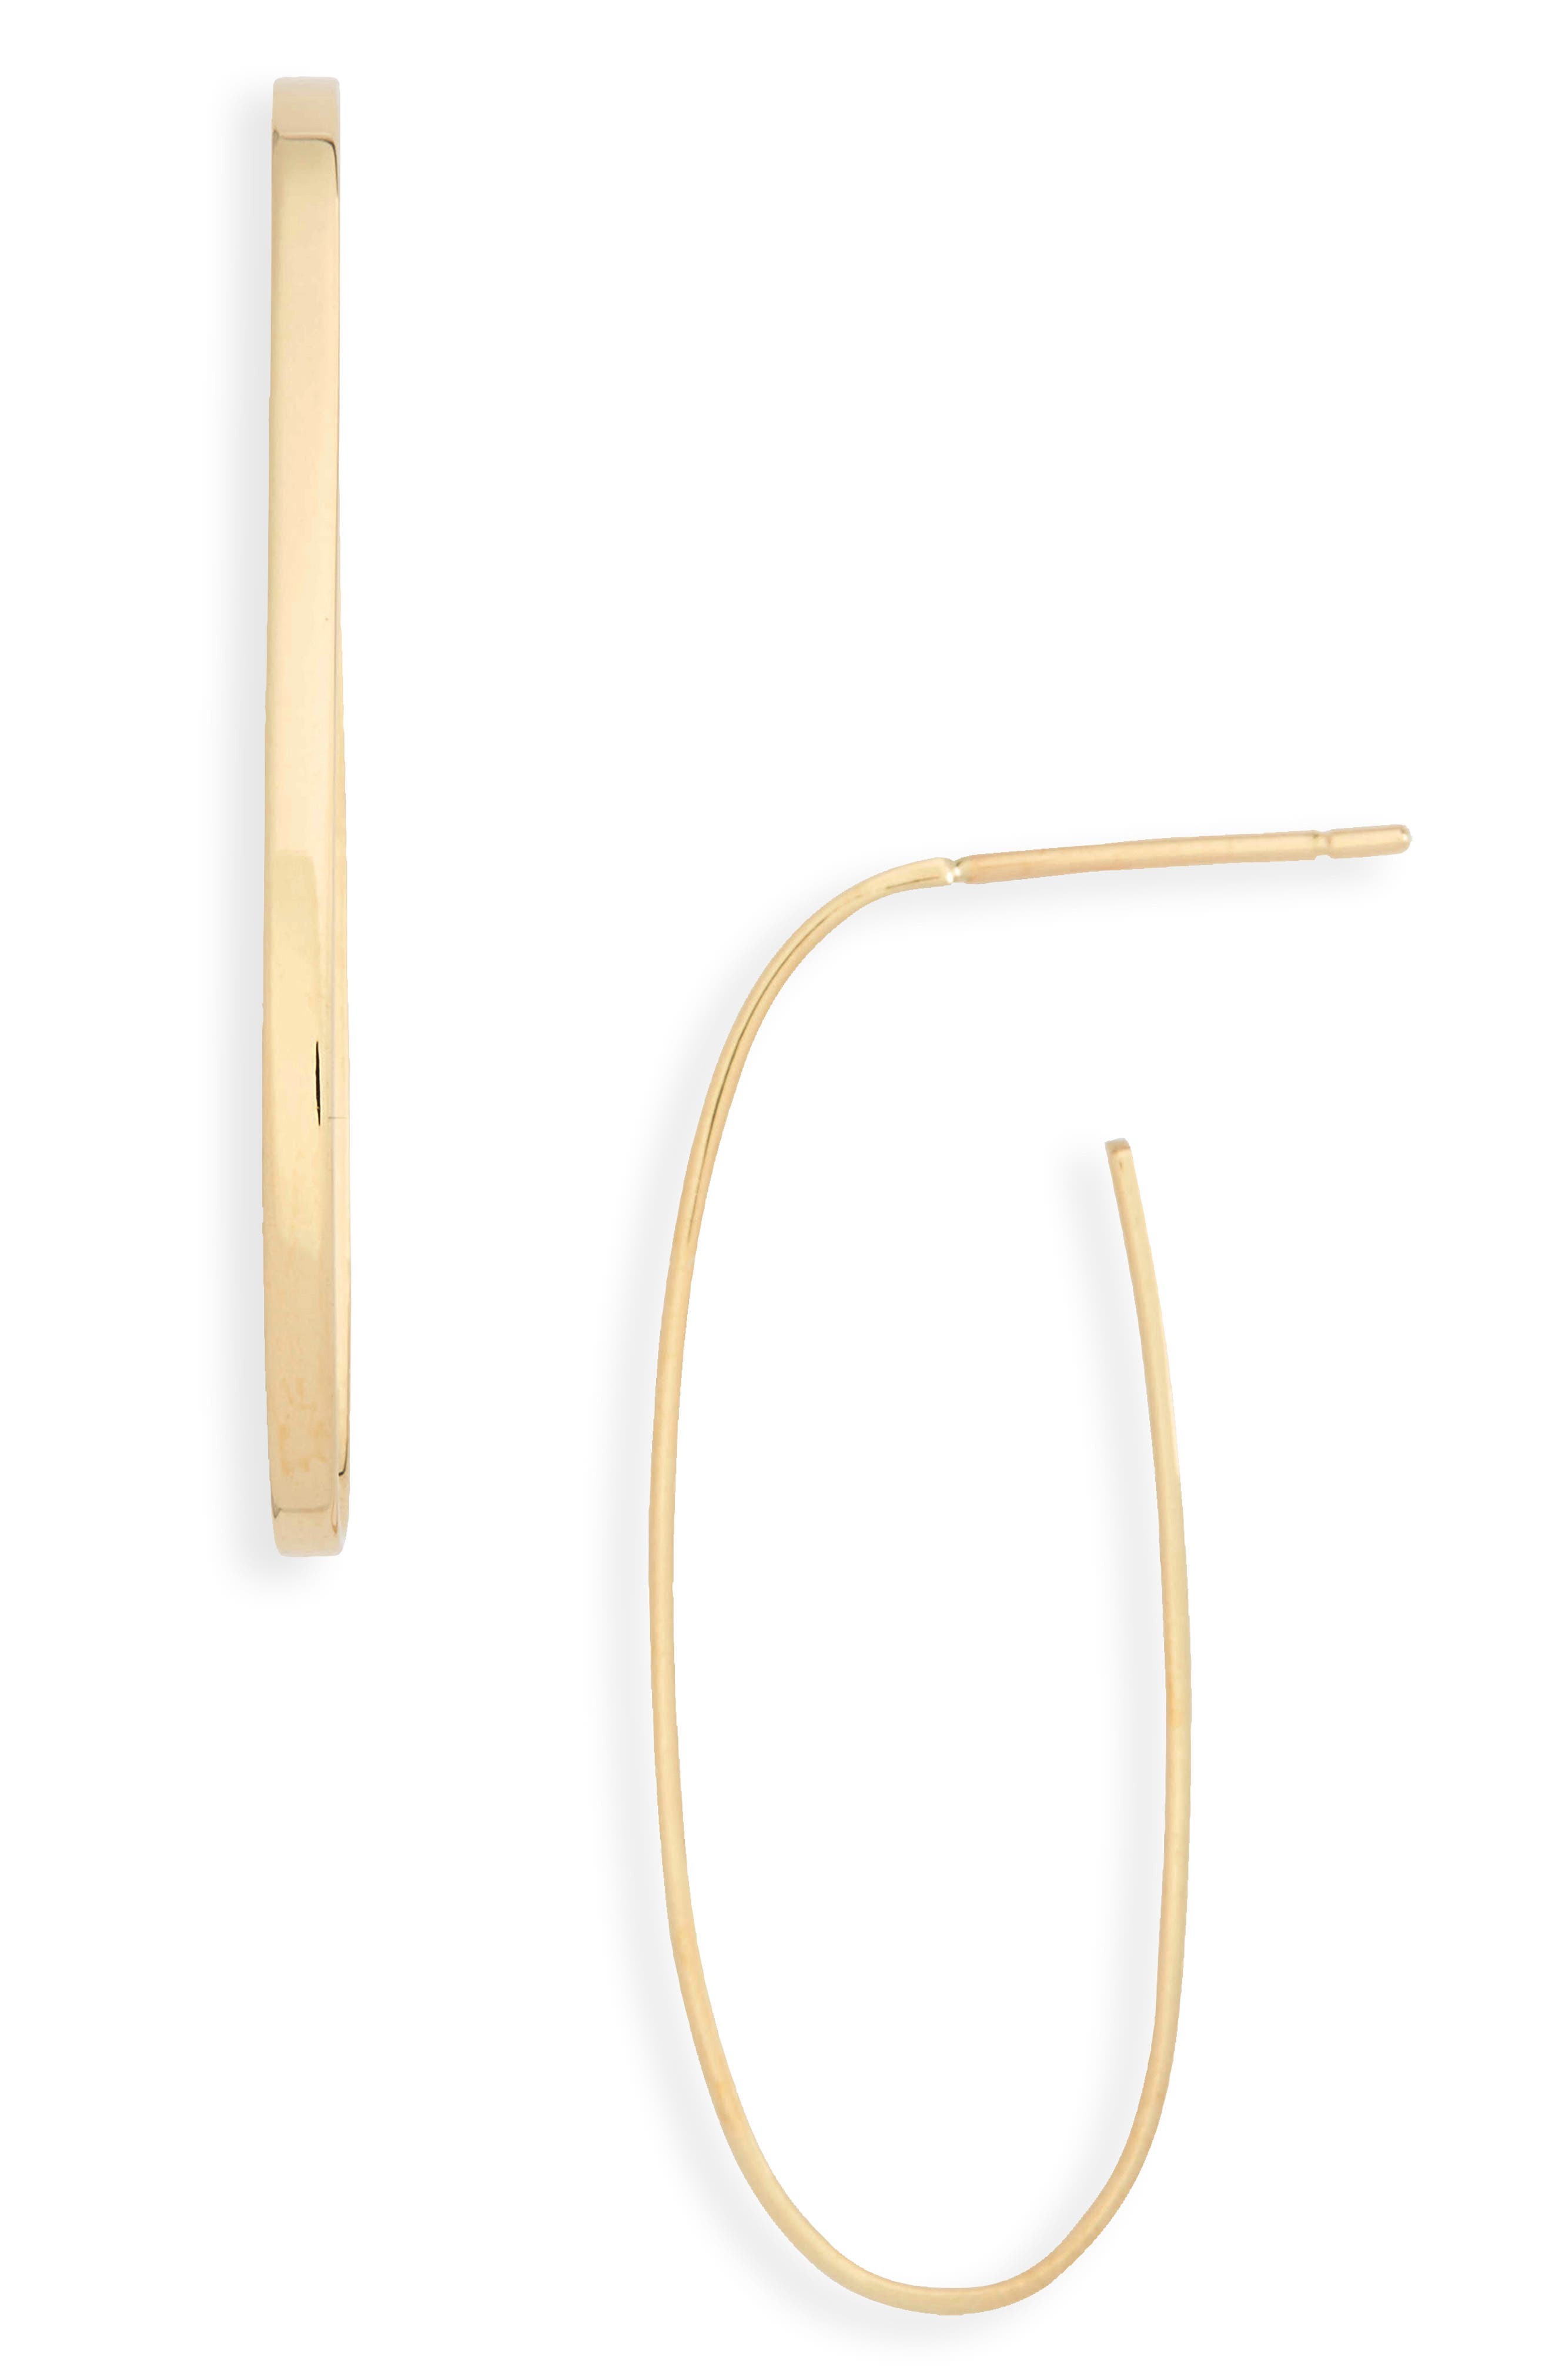 Flat Long Oval Hoop Earrings,                         Main,                         color, YELLOW GOLD